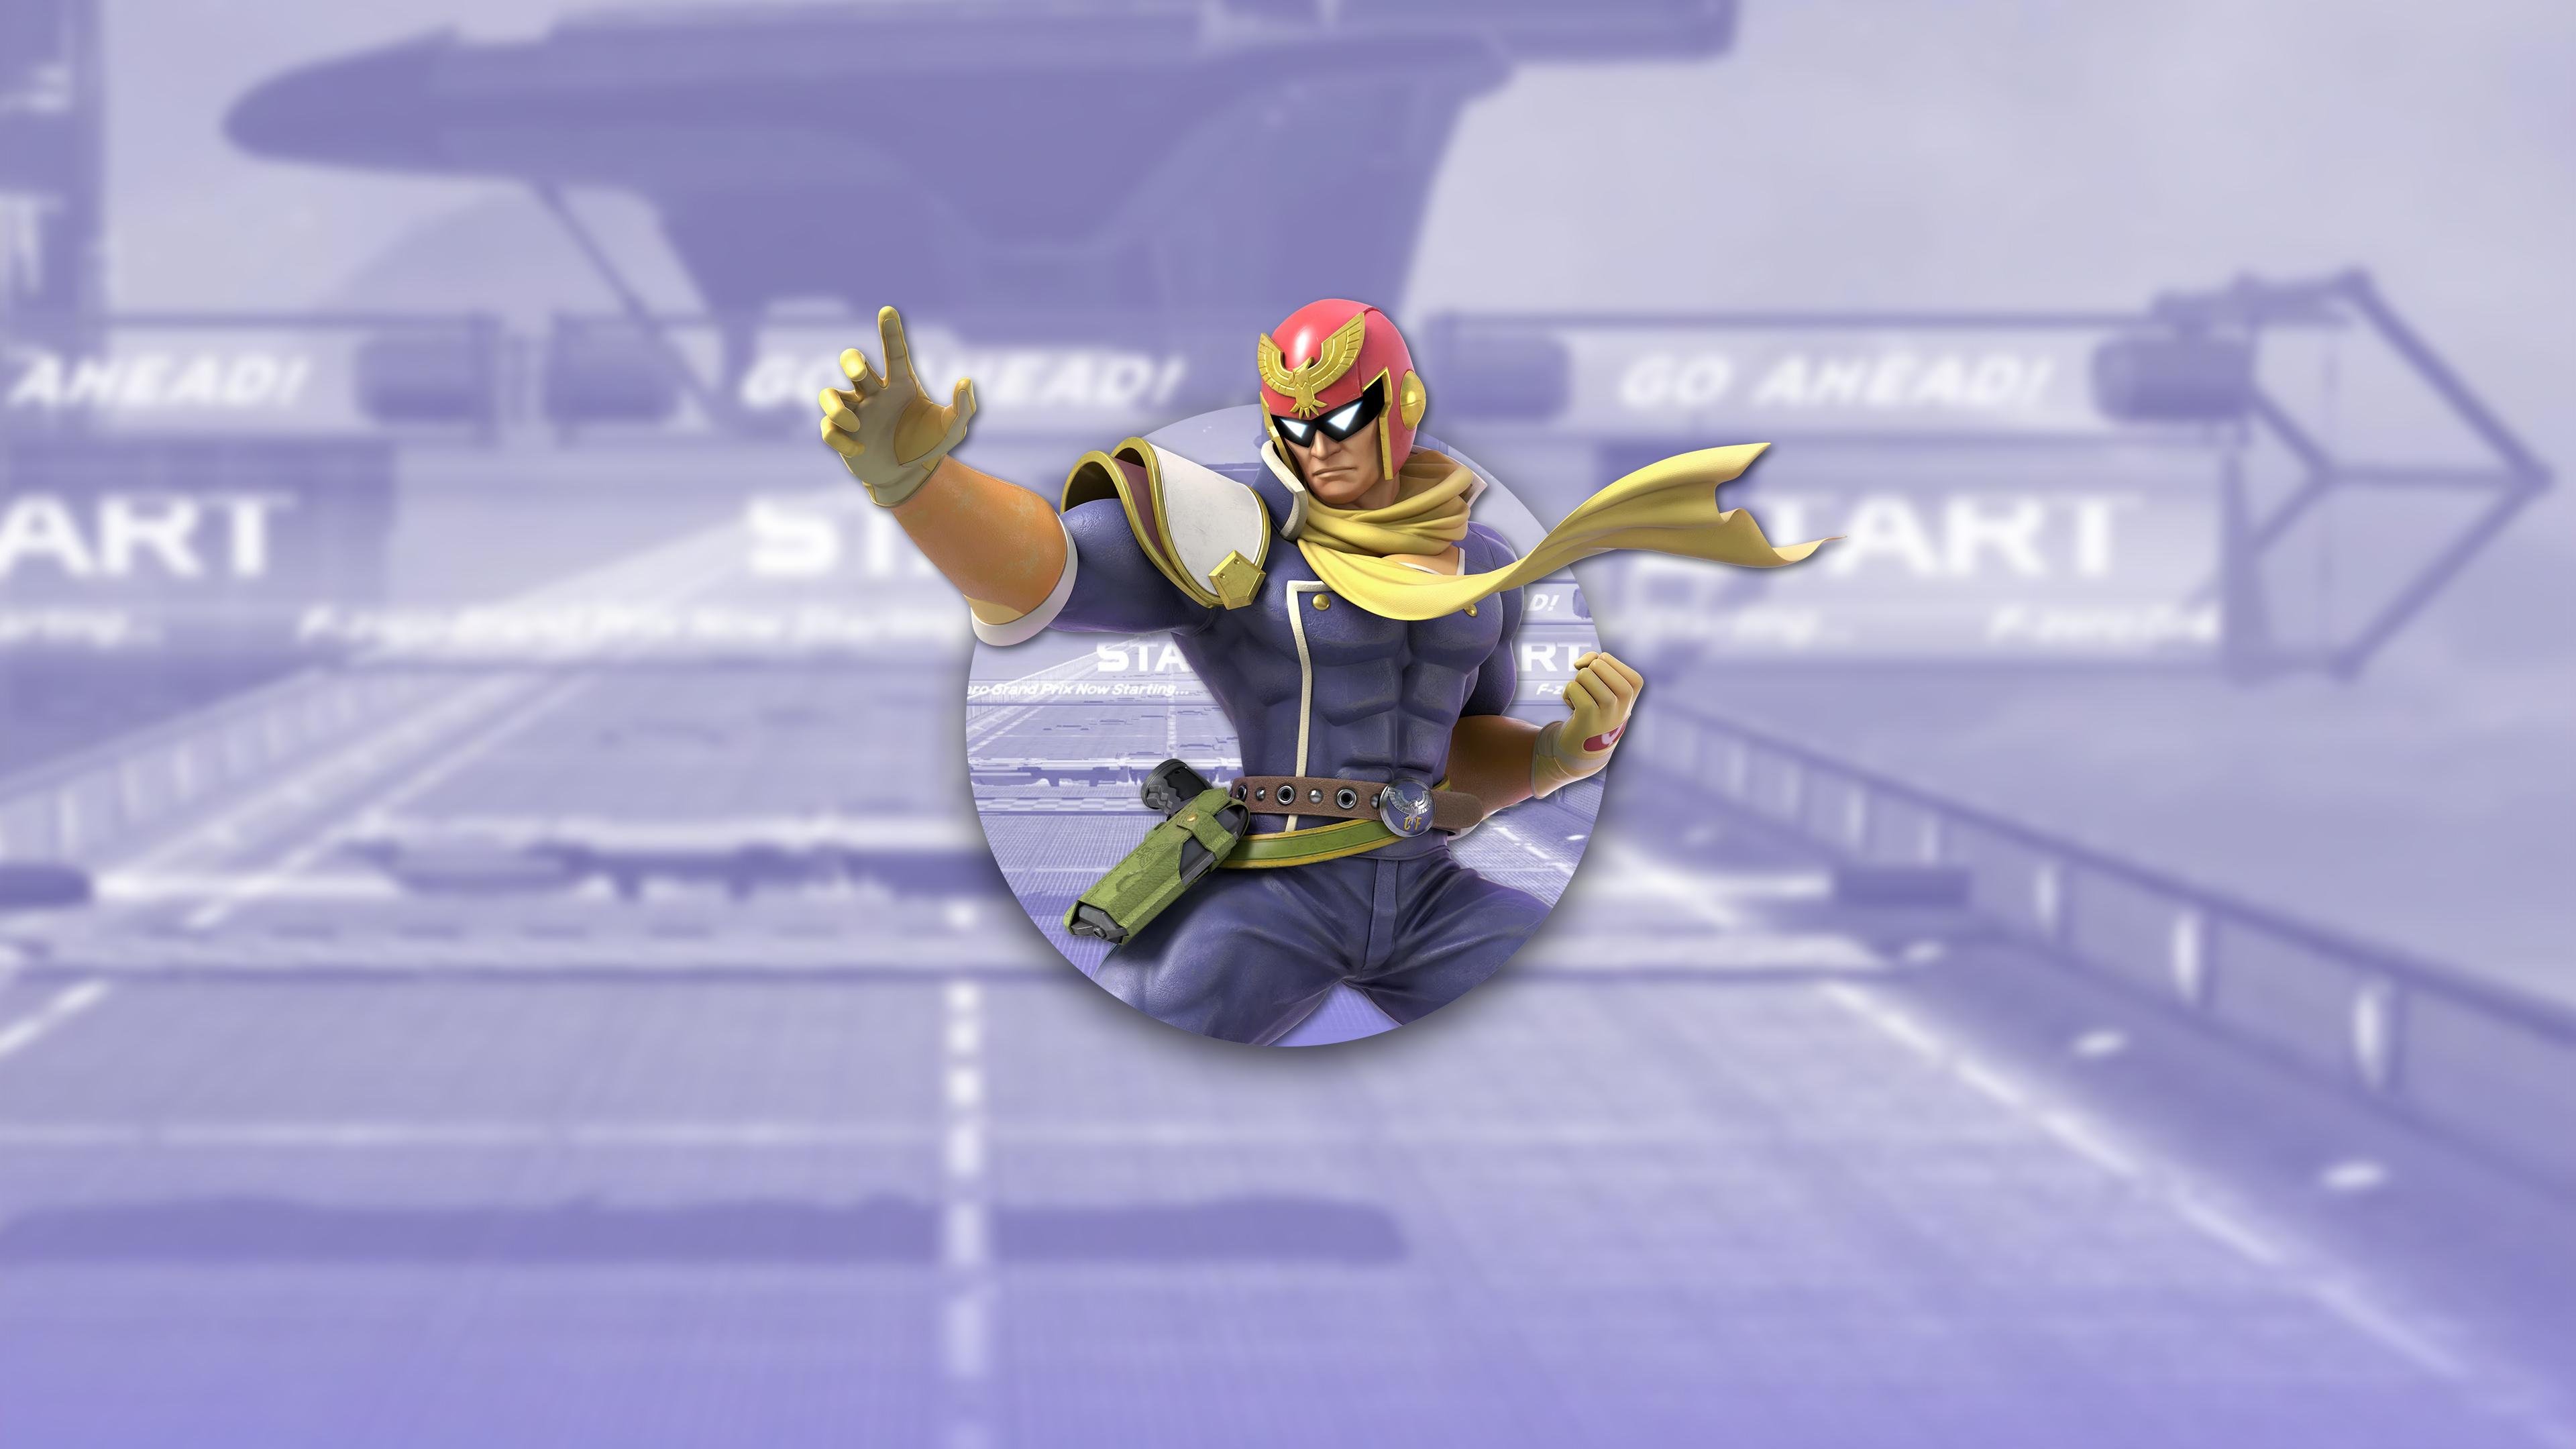 super smash bros ultimate captain falcon uhd 4k wallpaper